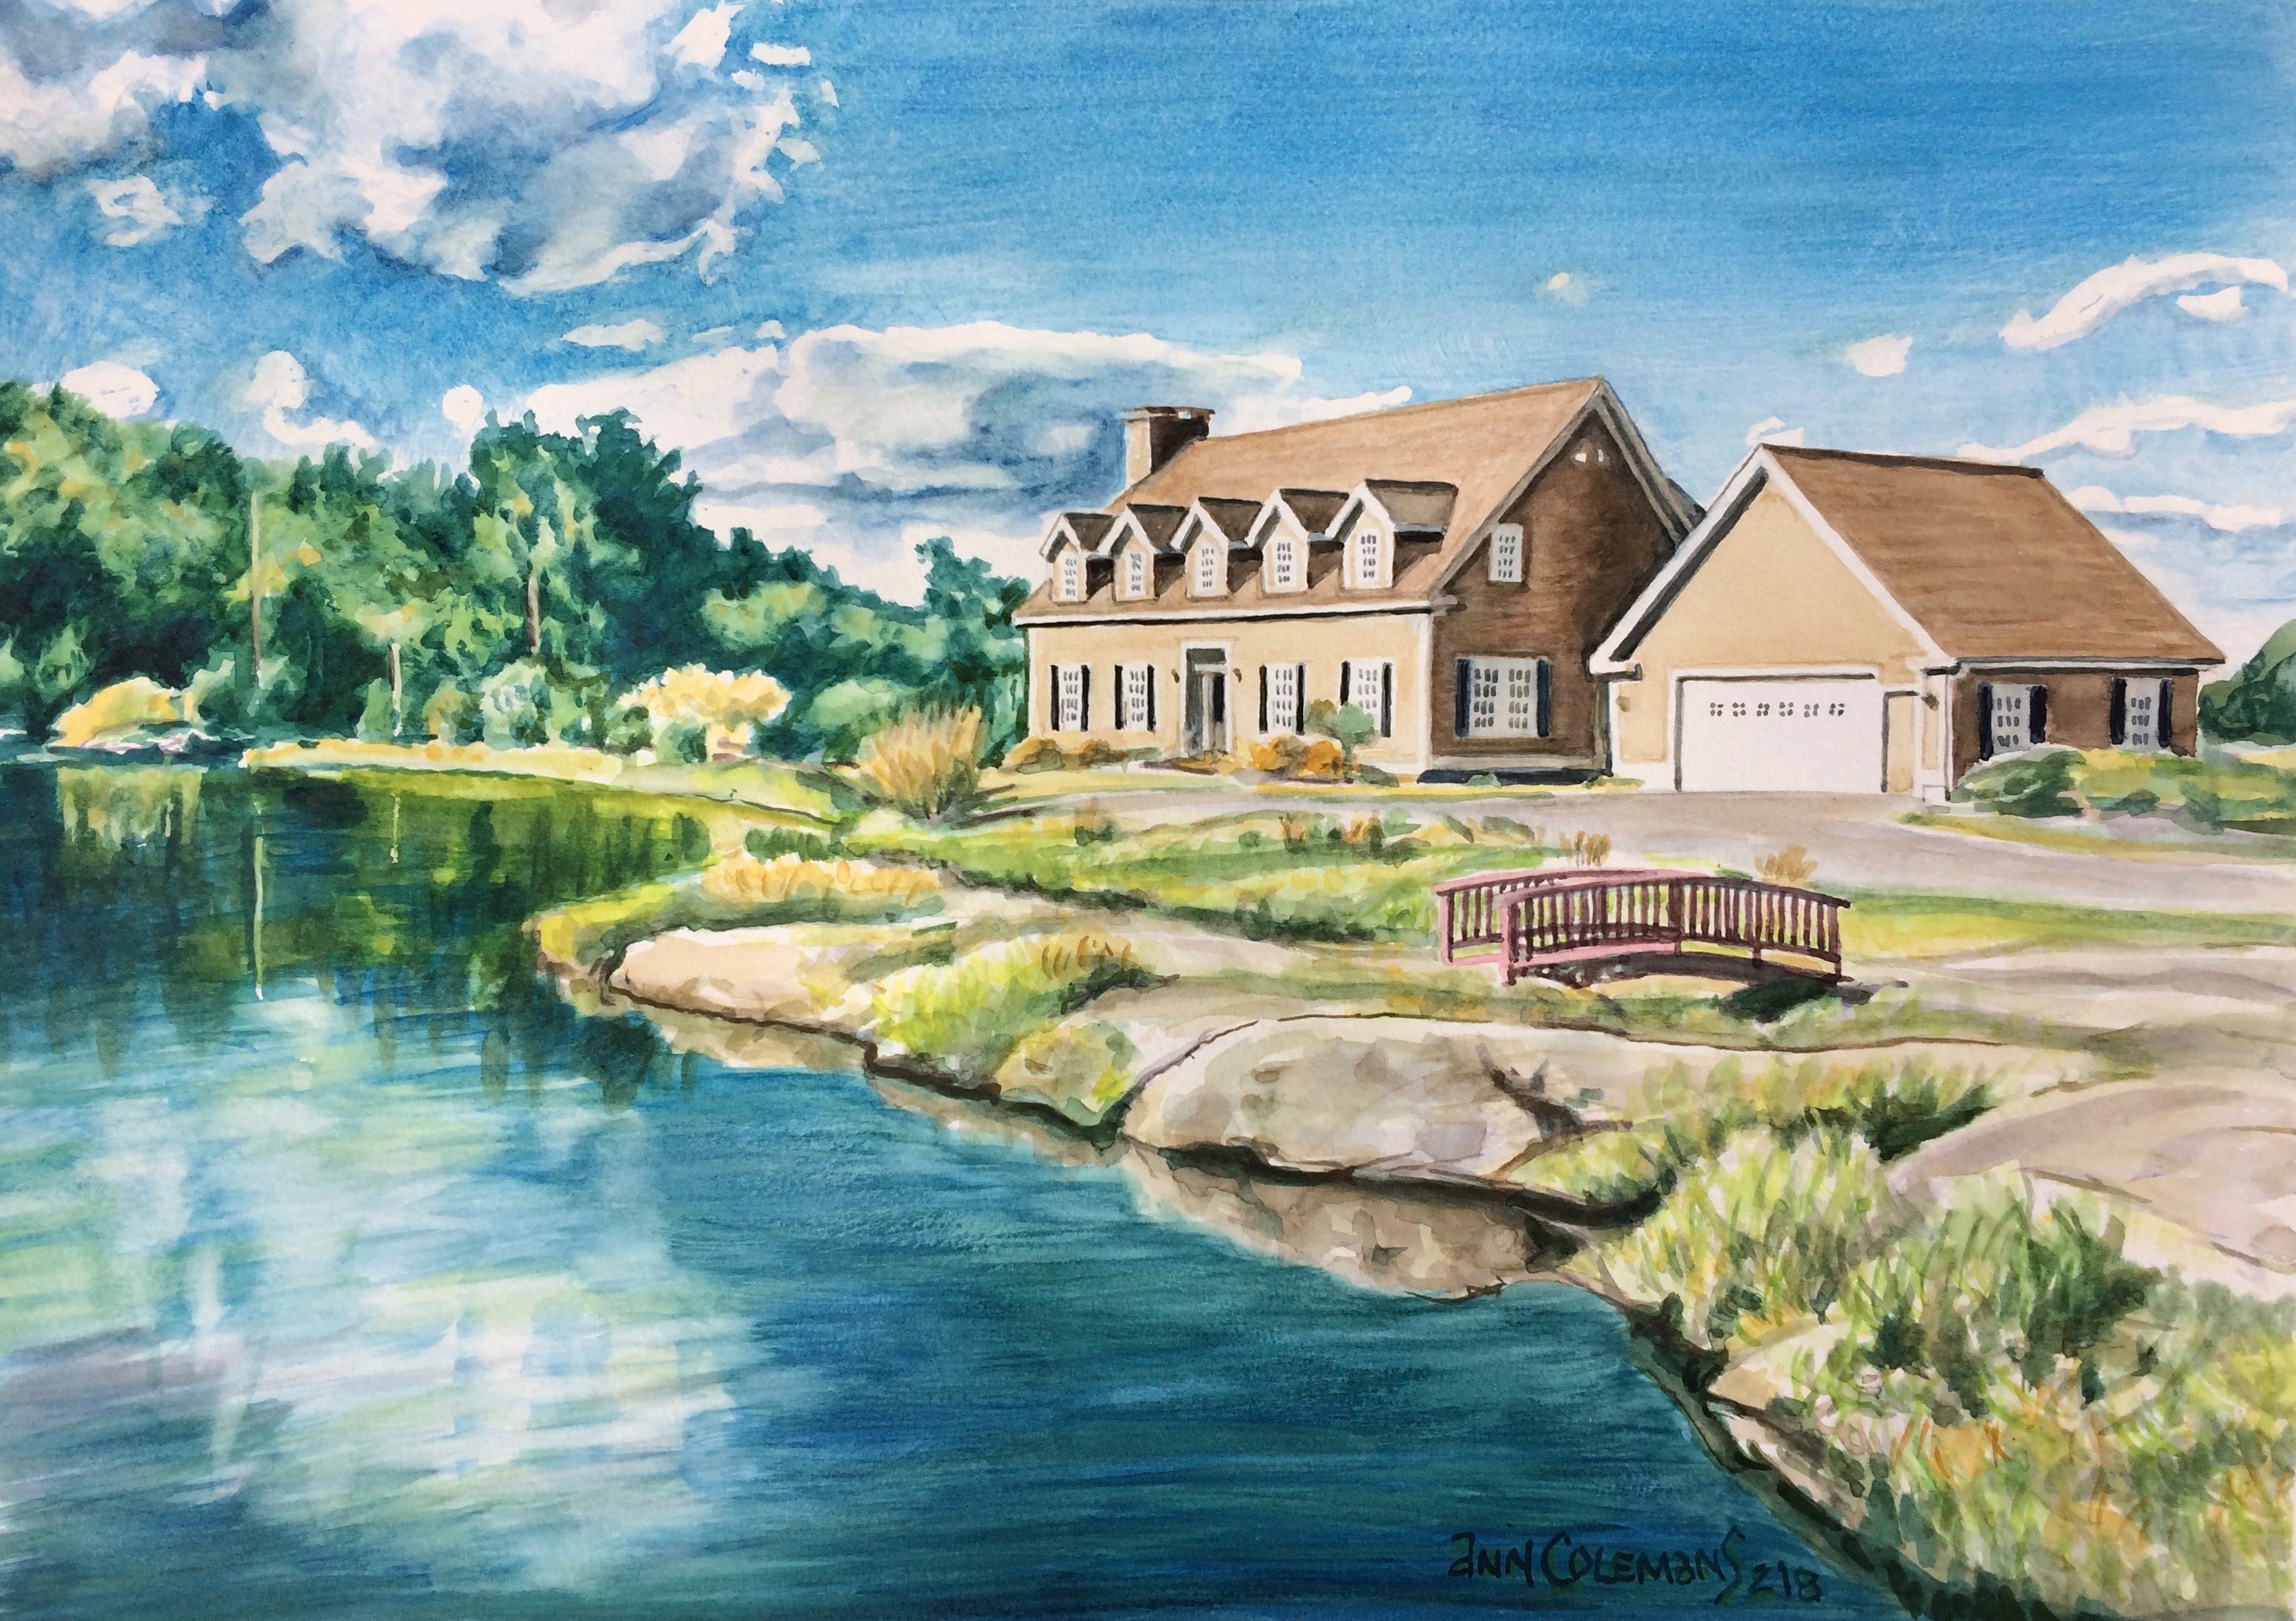 Jodi Krasnow House Wilmington, VT